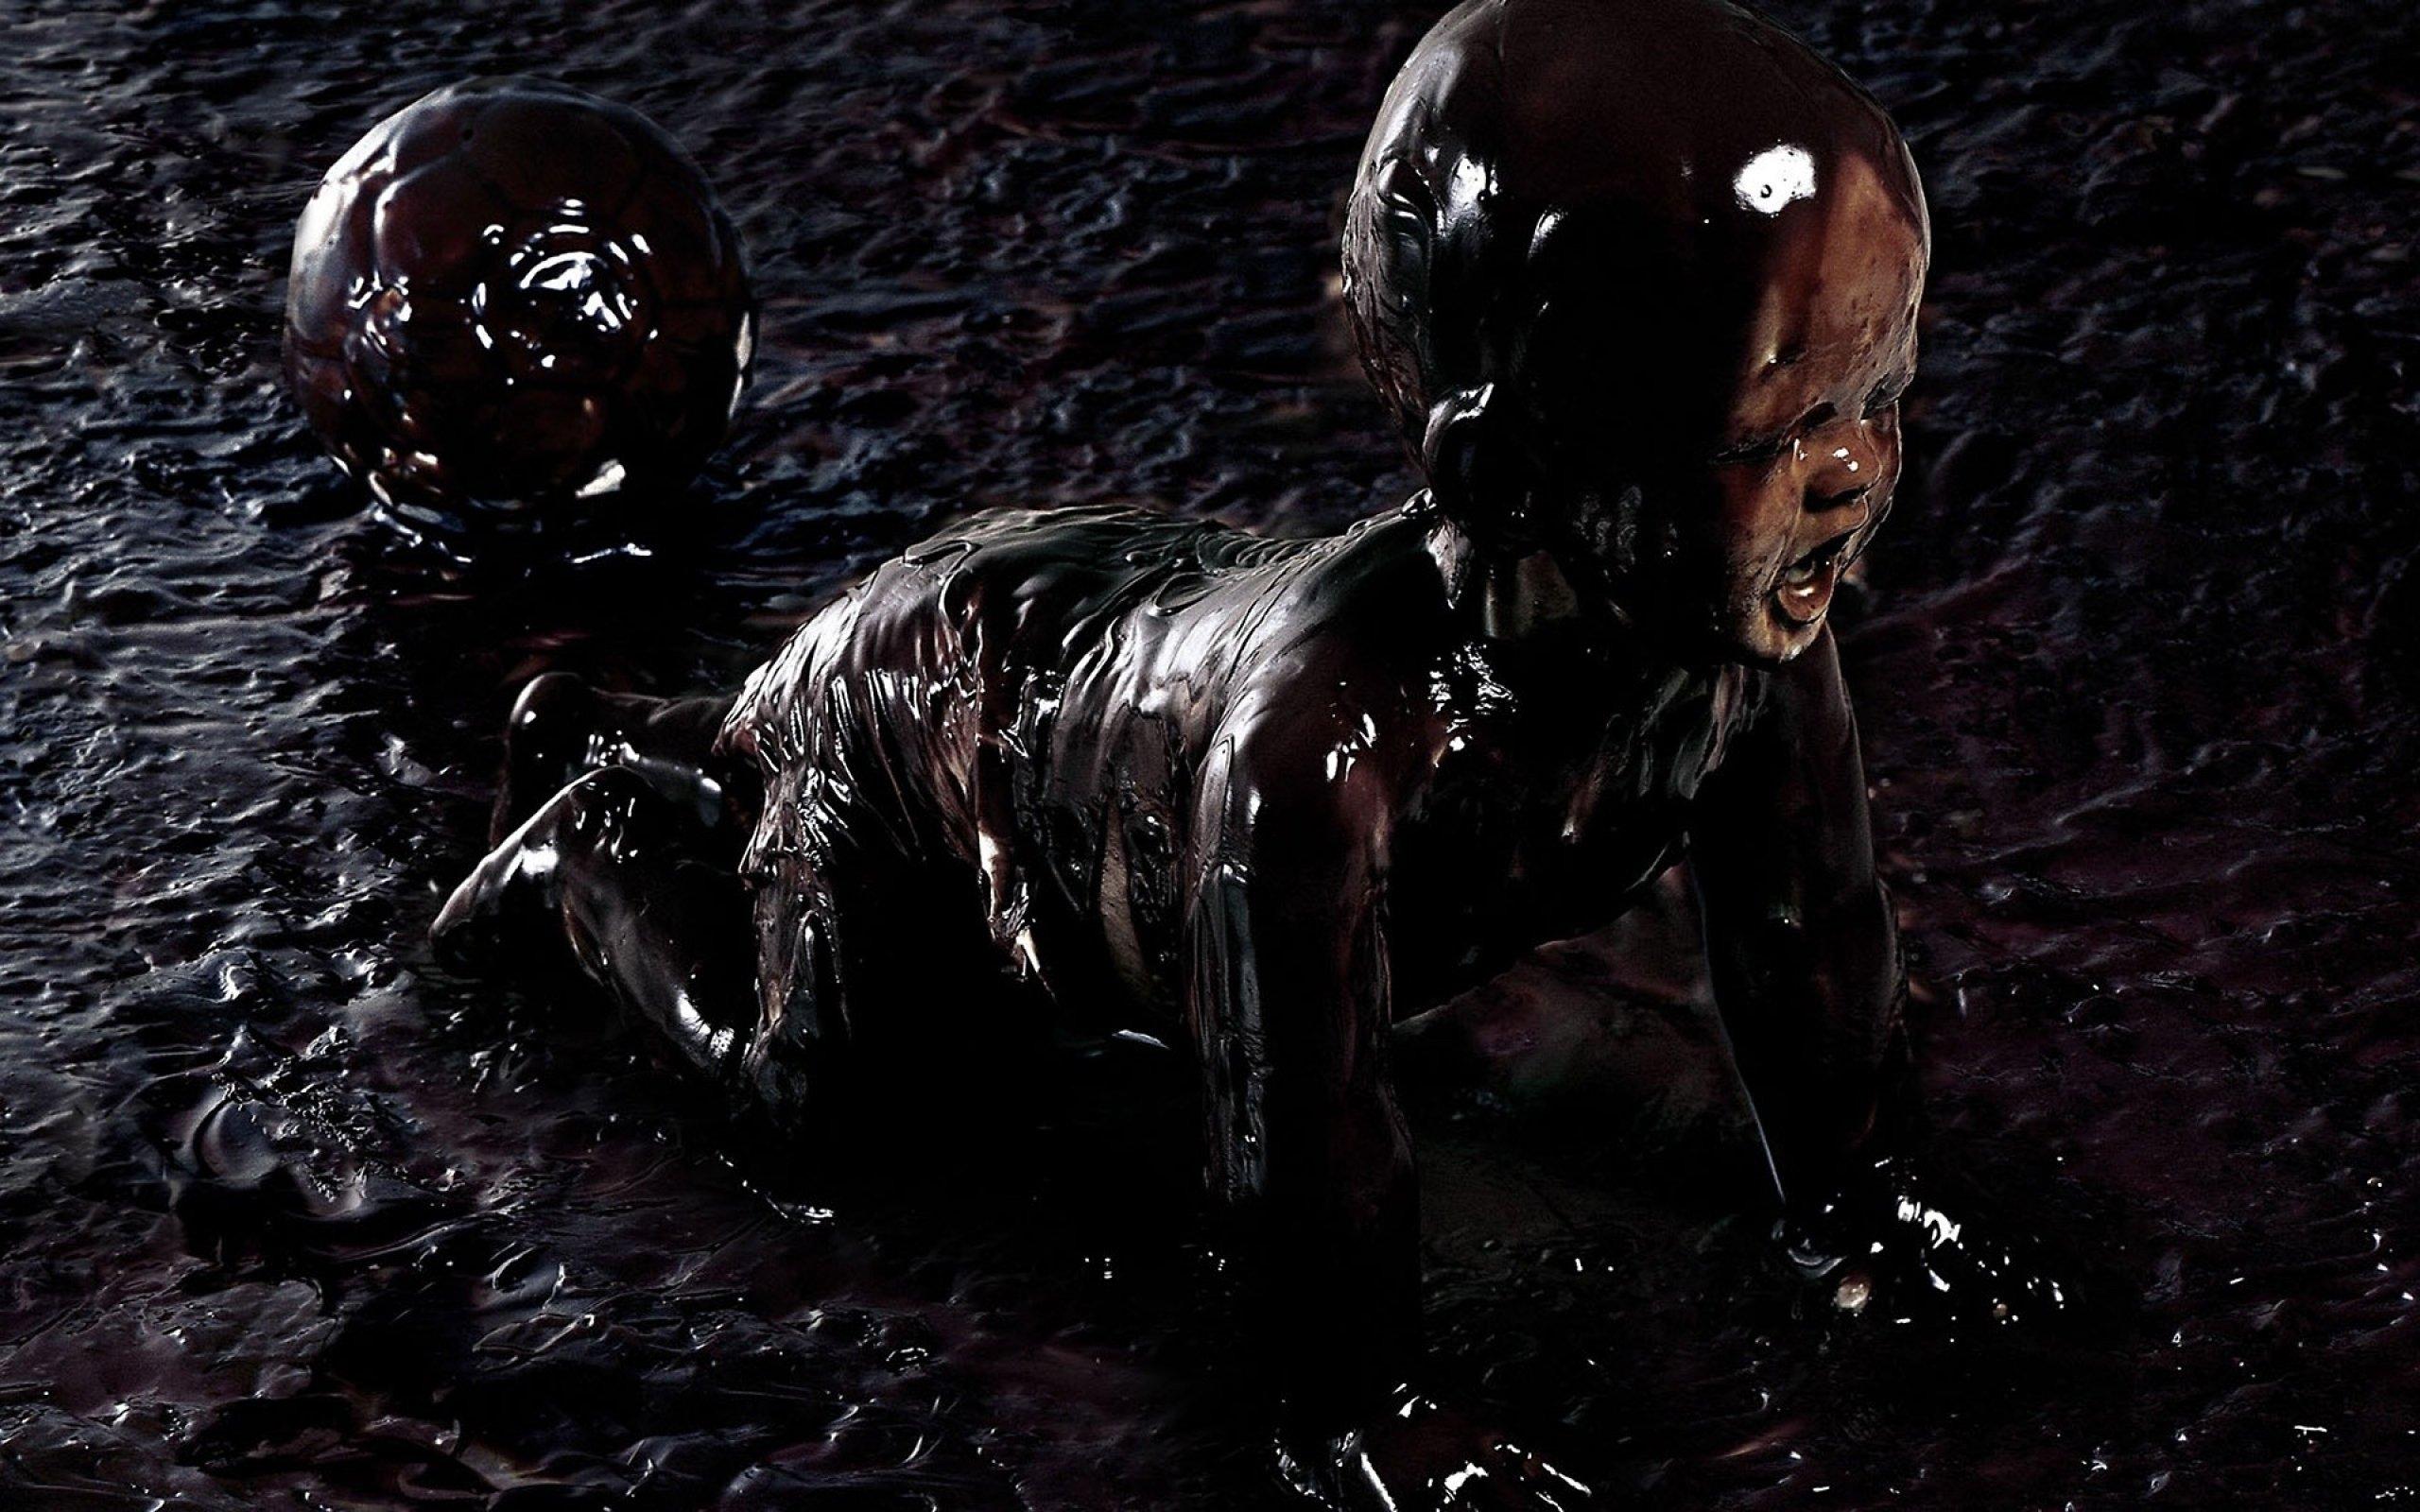 Fall Chevron Wallpaper Dark Creepy Scary Horror Evil Art Artwork Wallpaper